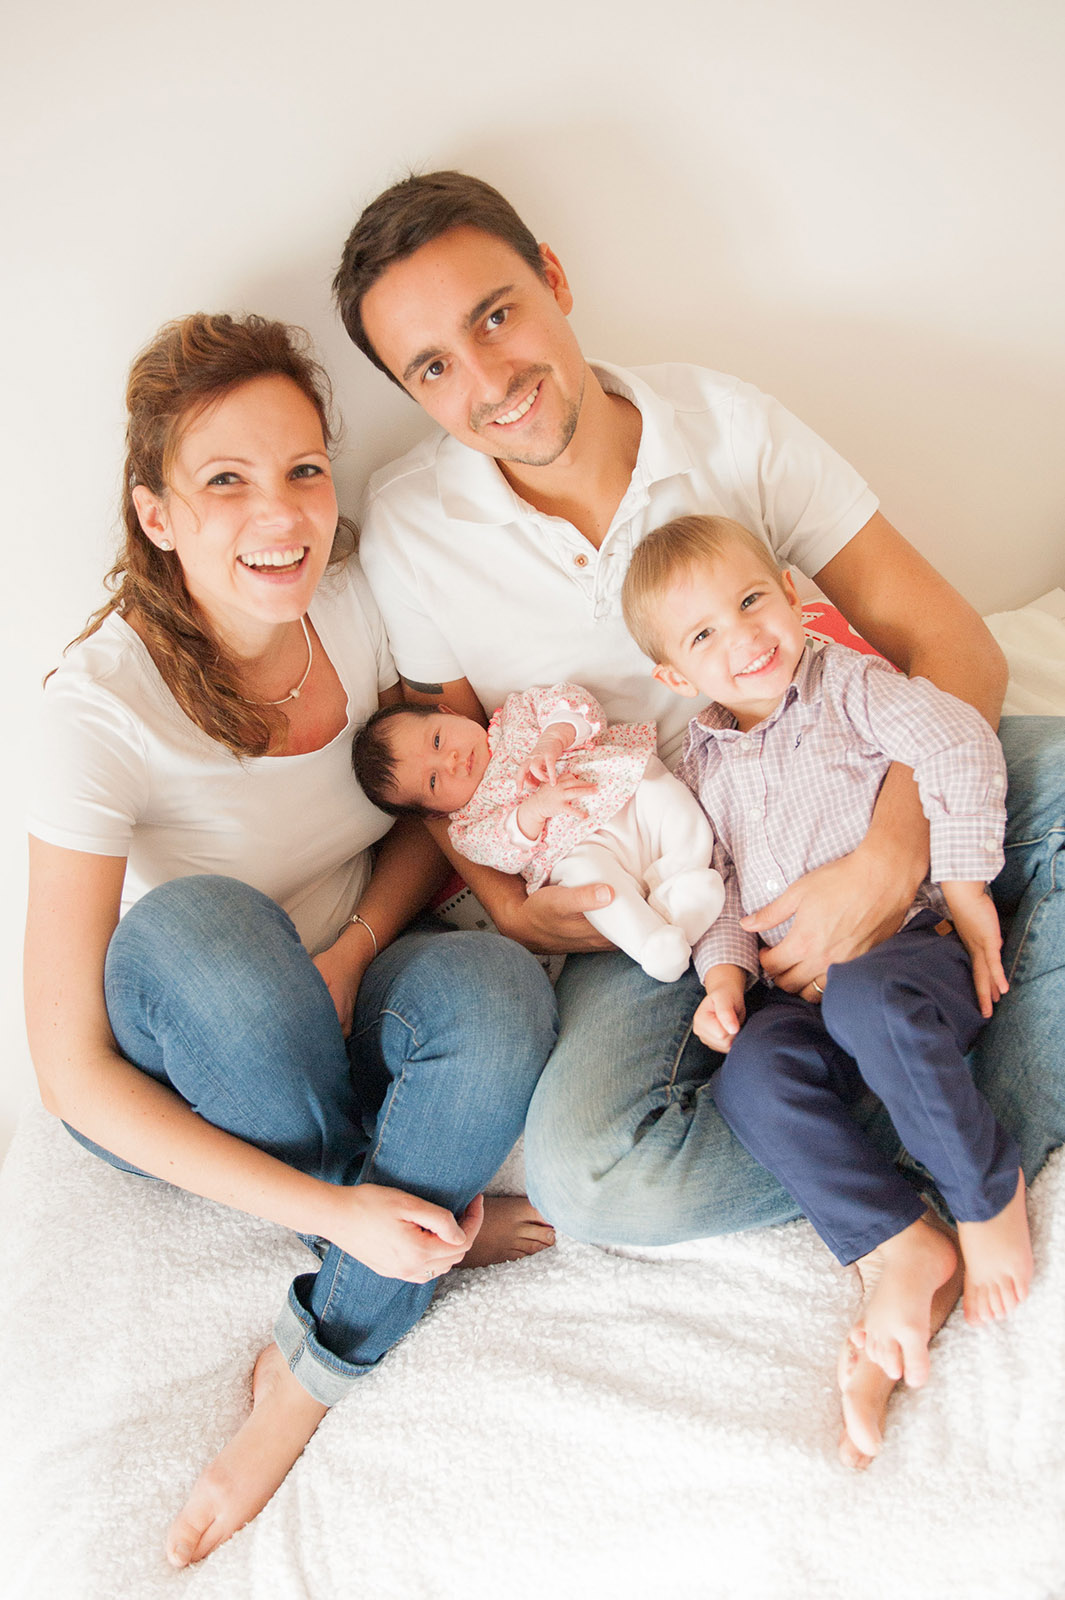 seance-photo-famille-photo-grossesse-photo-bébé-naissance-sabrina-godemert-photographe-seine-et-marne030